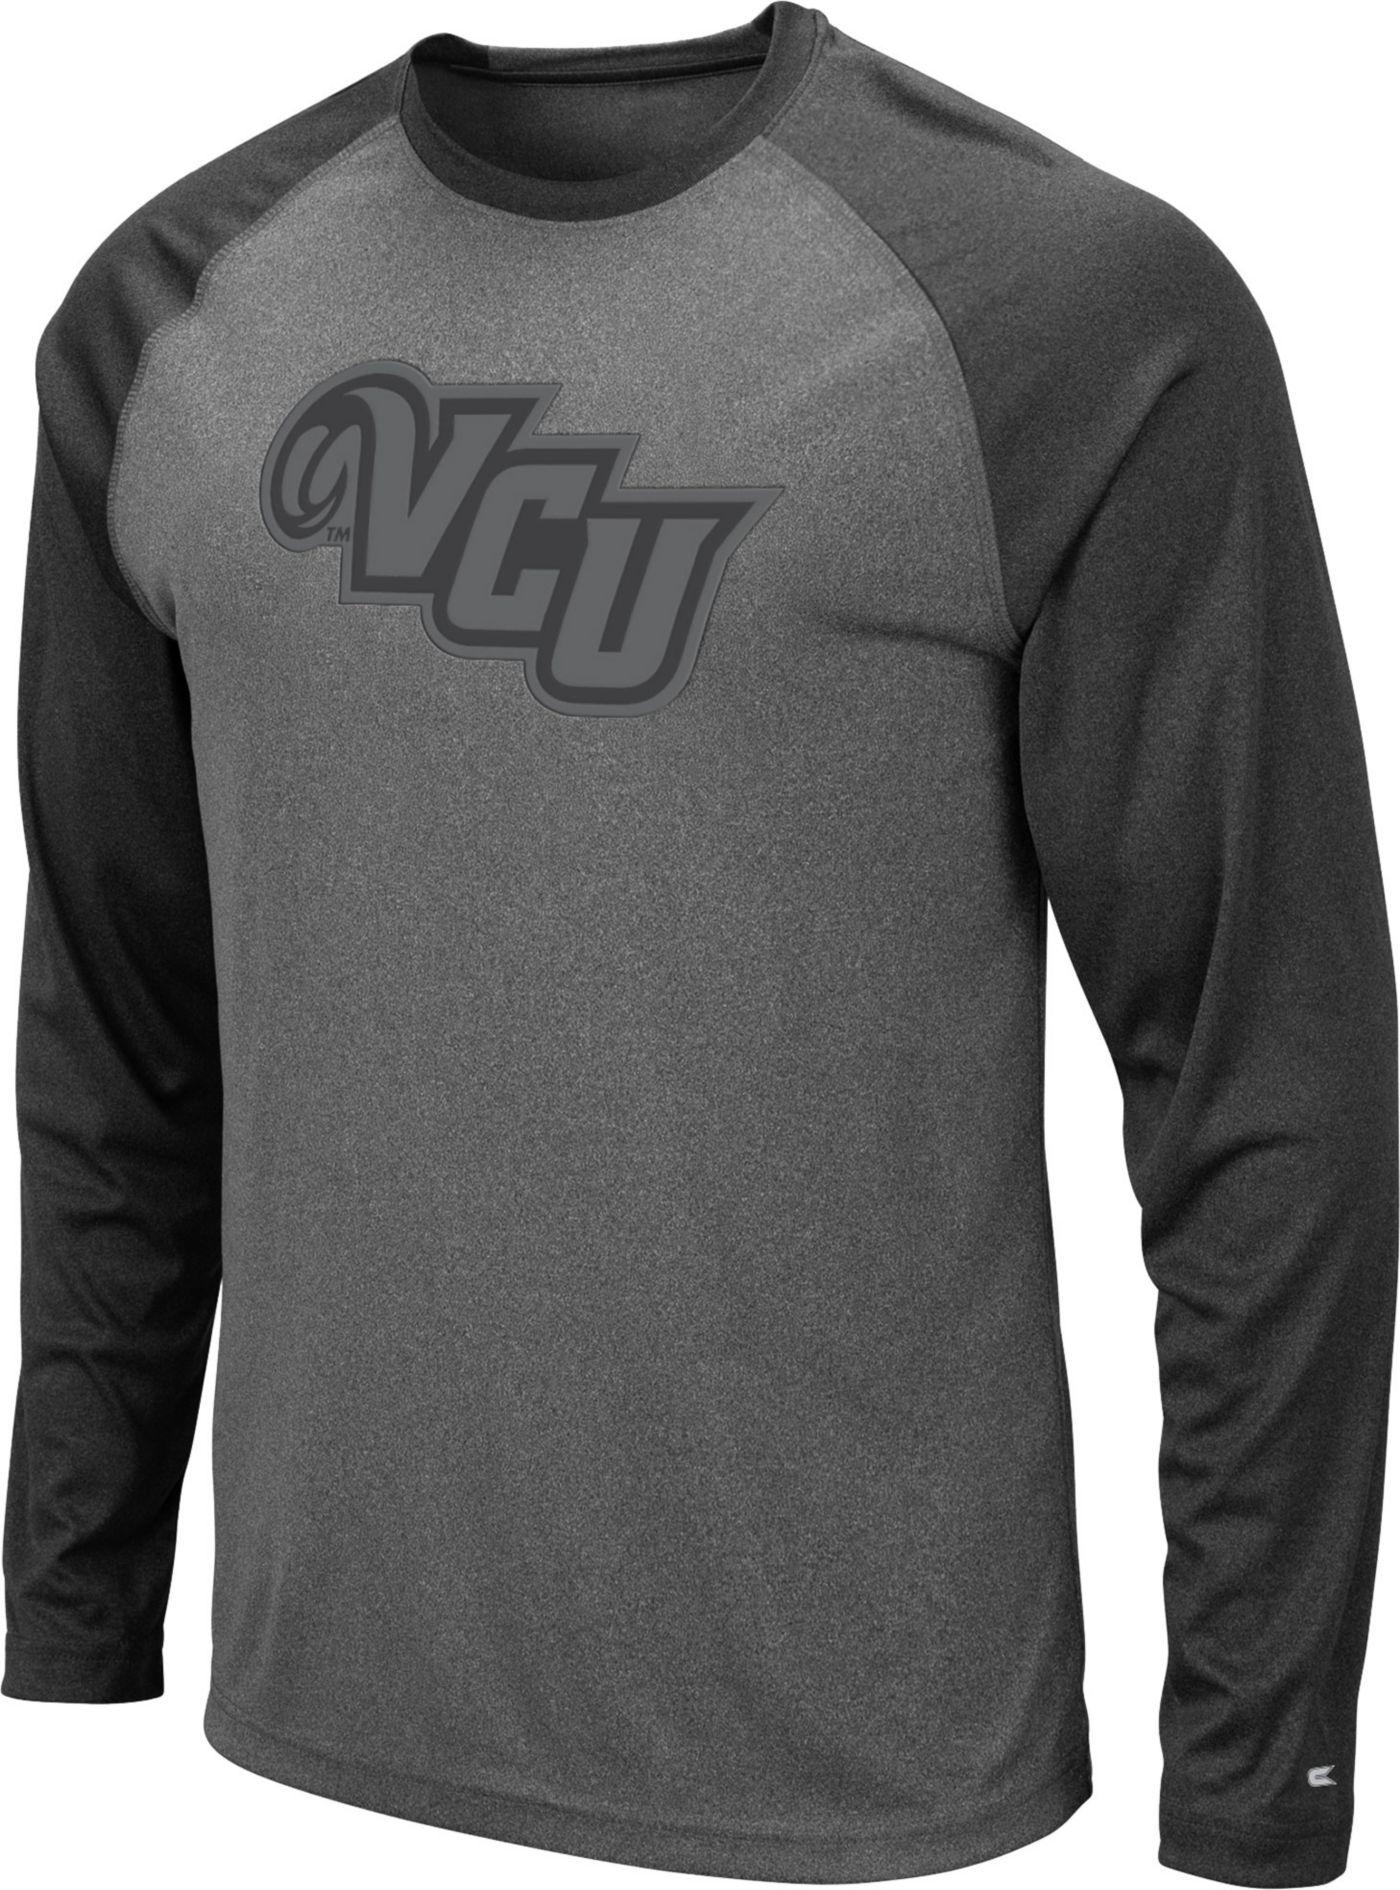 Colosseum Men's VCU Rams Grey Rad Tad Raglan Long Sleeve T-Shirt